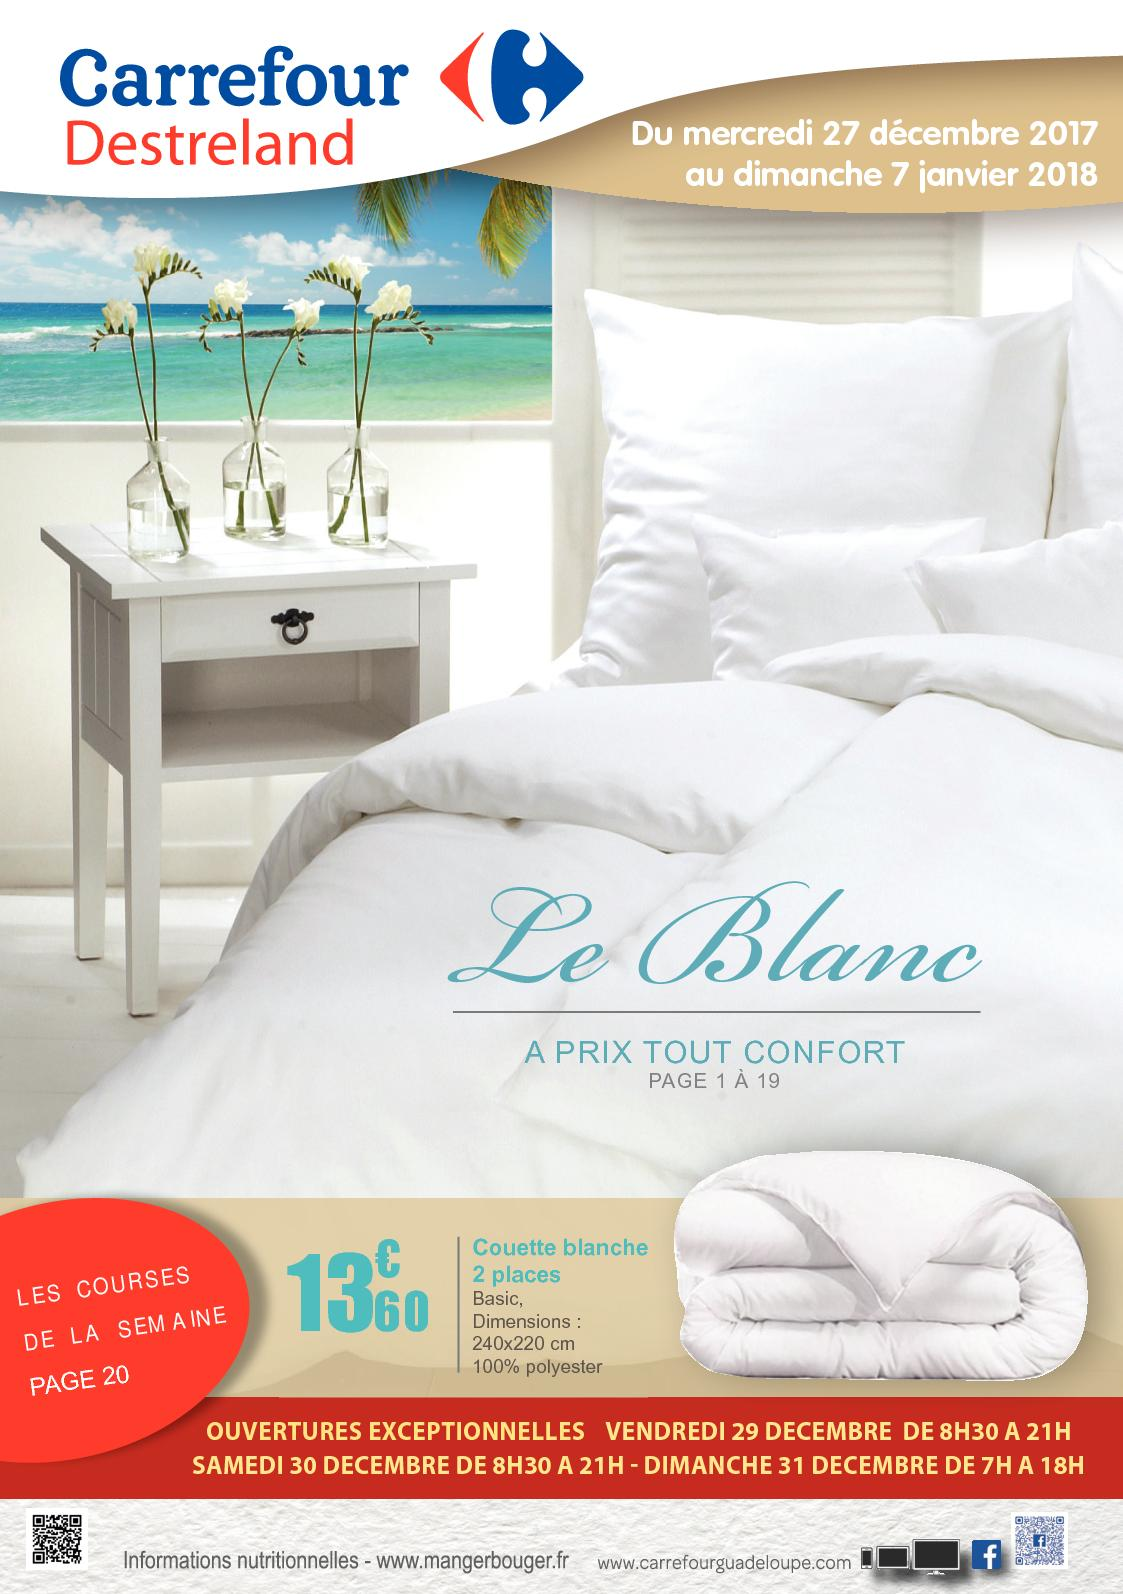 Calaméo Carrefour Guadeloupe Destreland Catalogue Blanc 2018